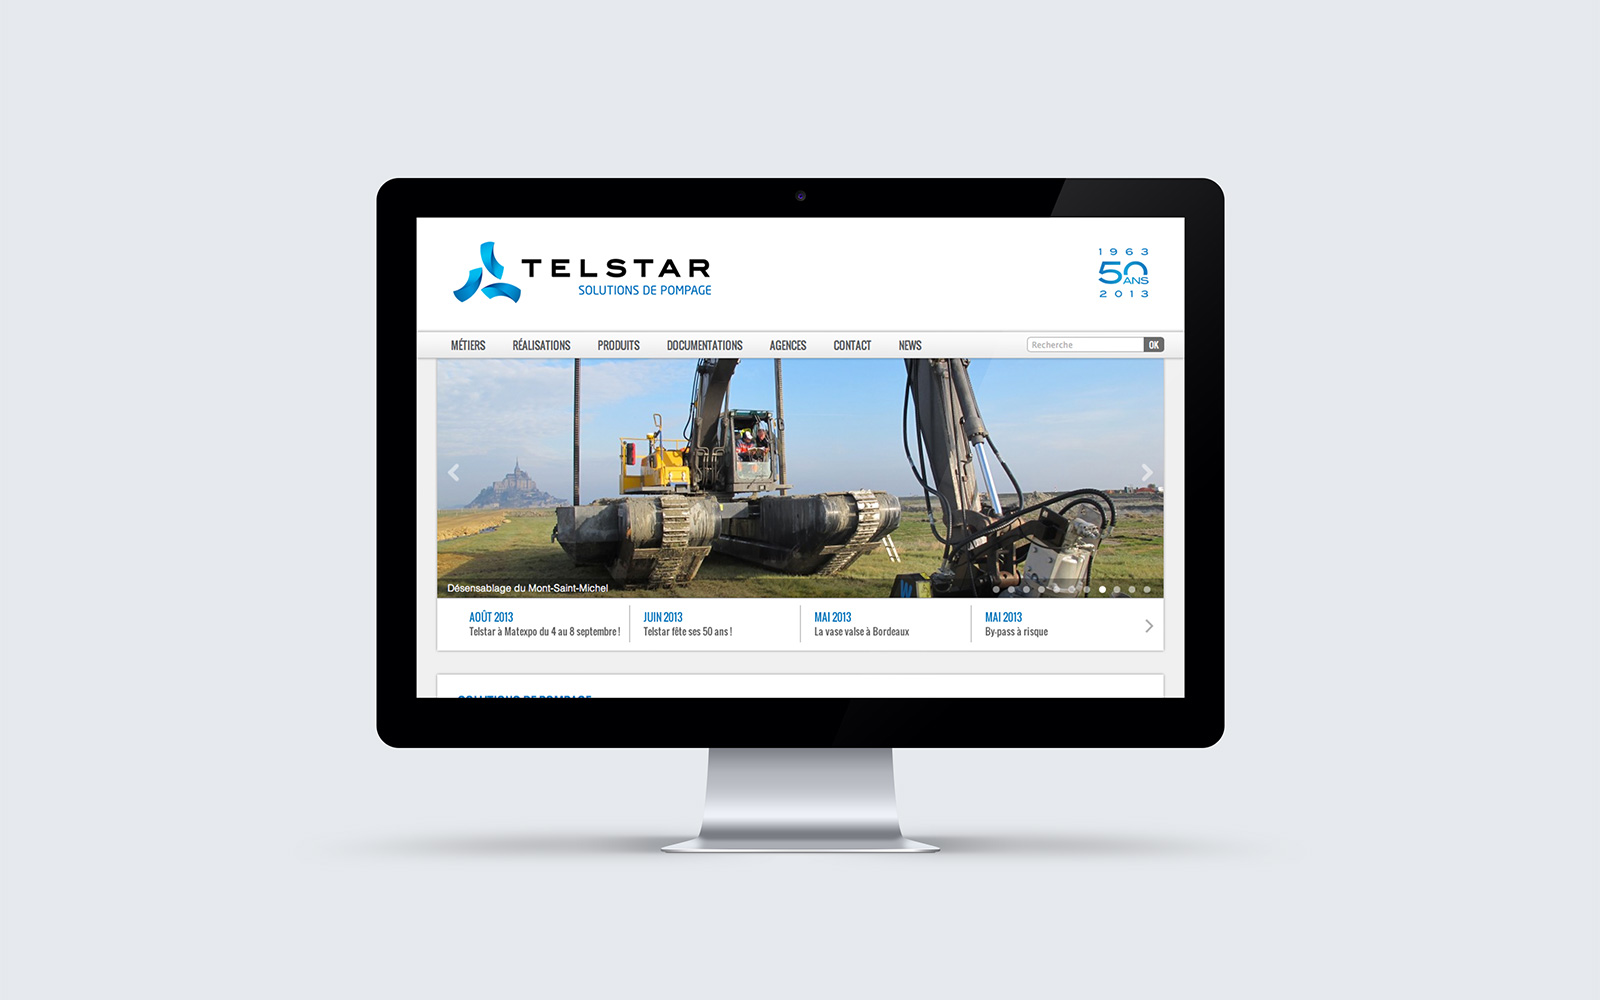 Telstar site